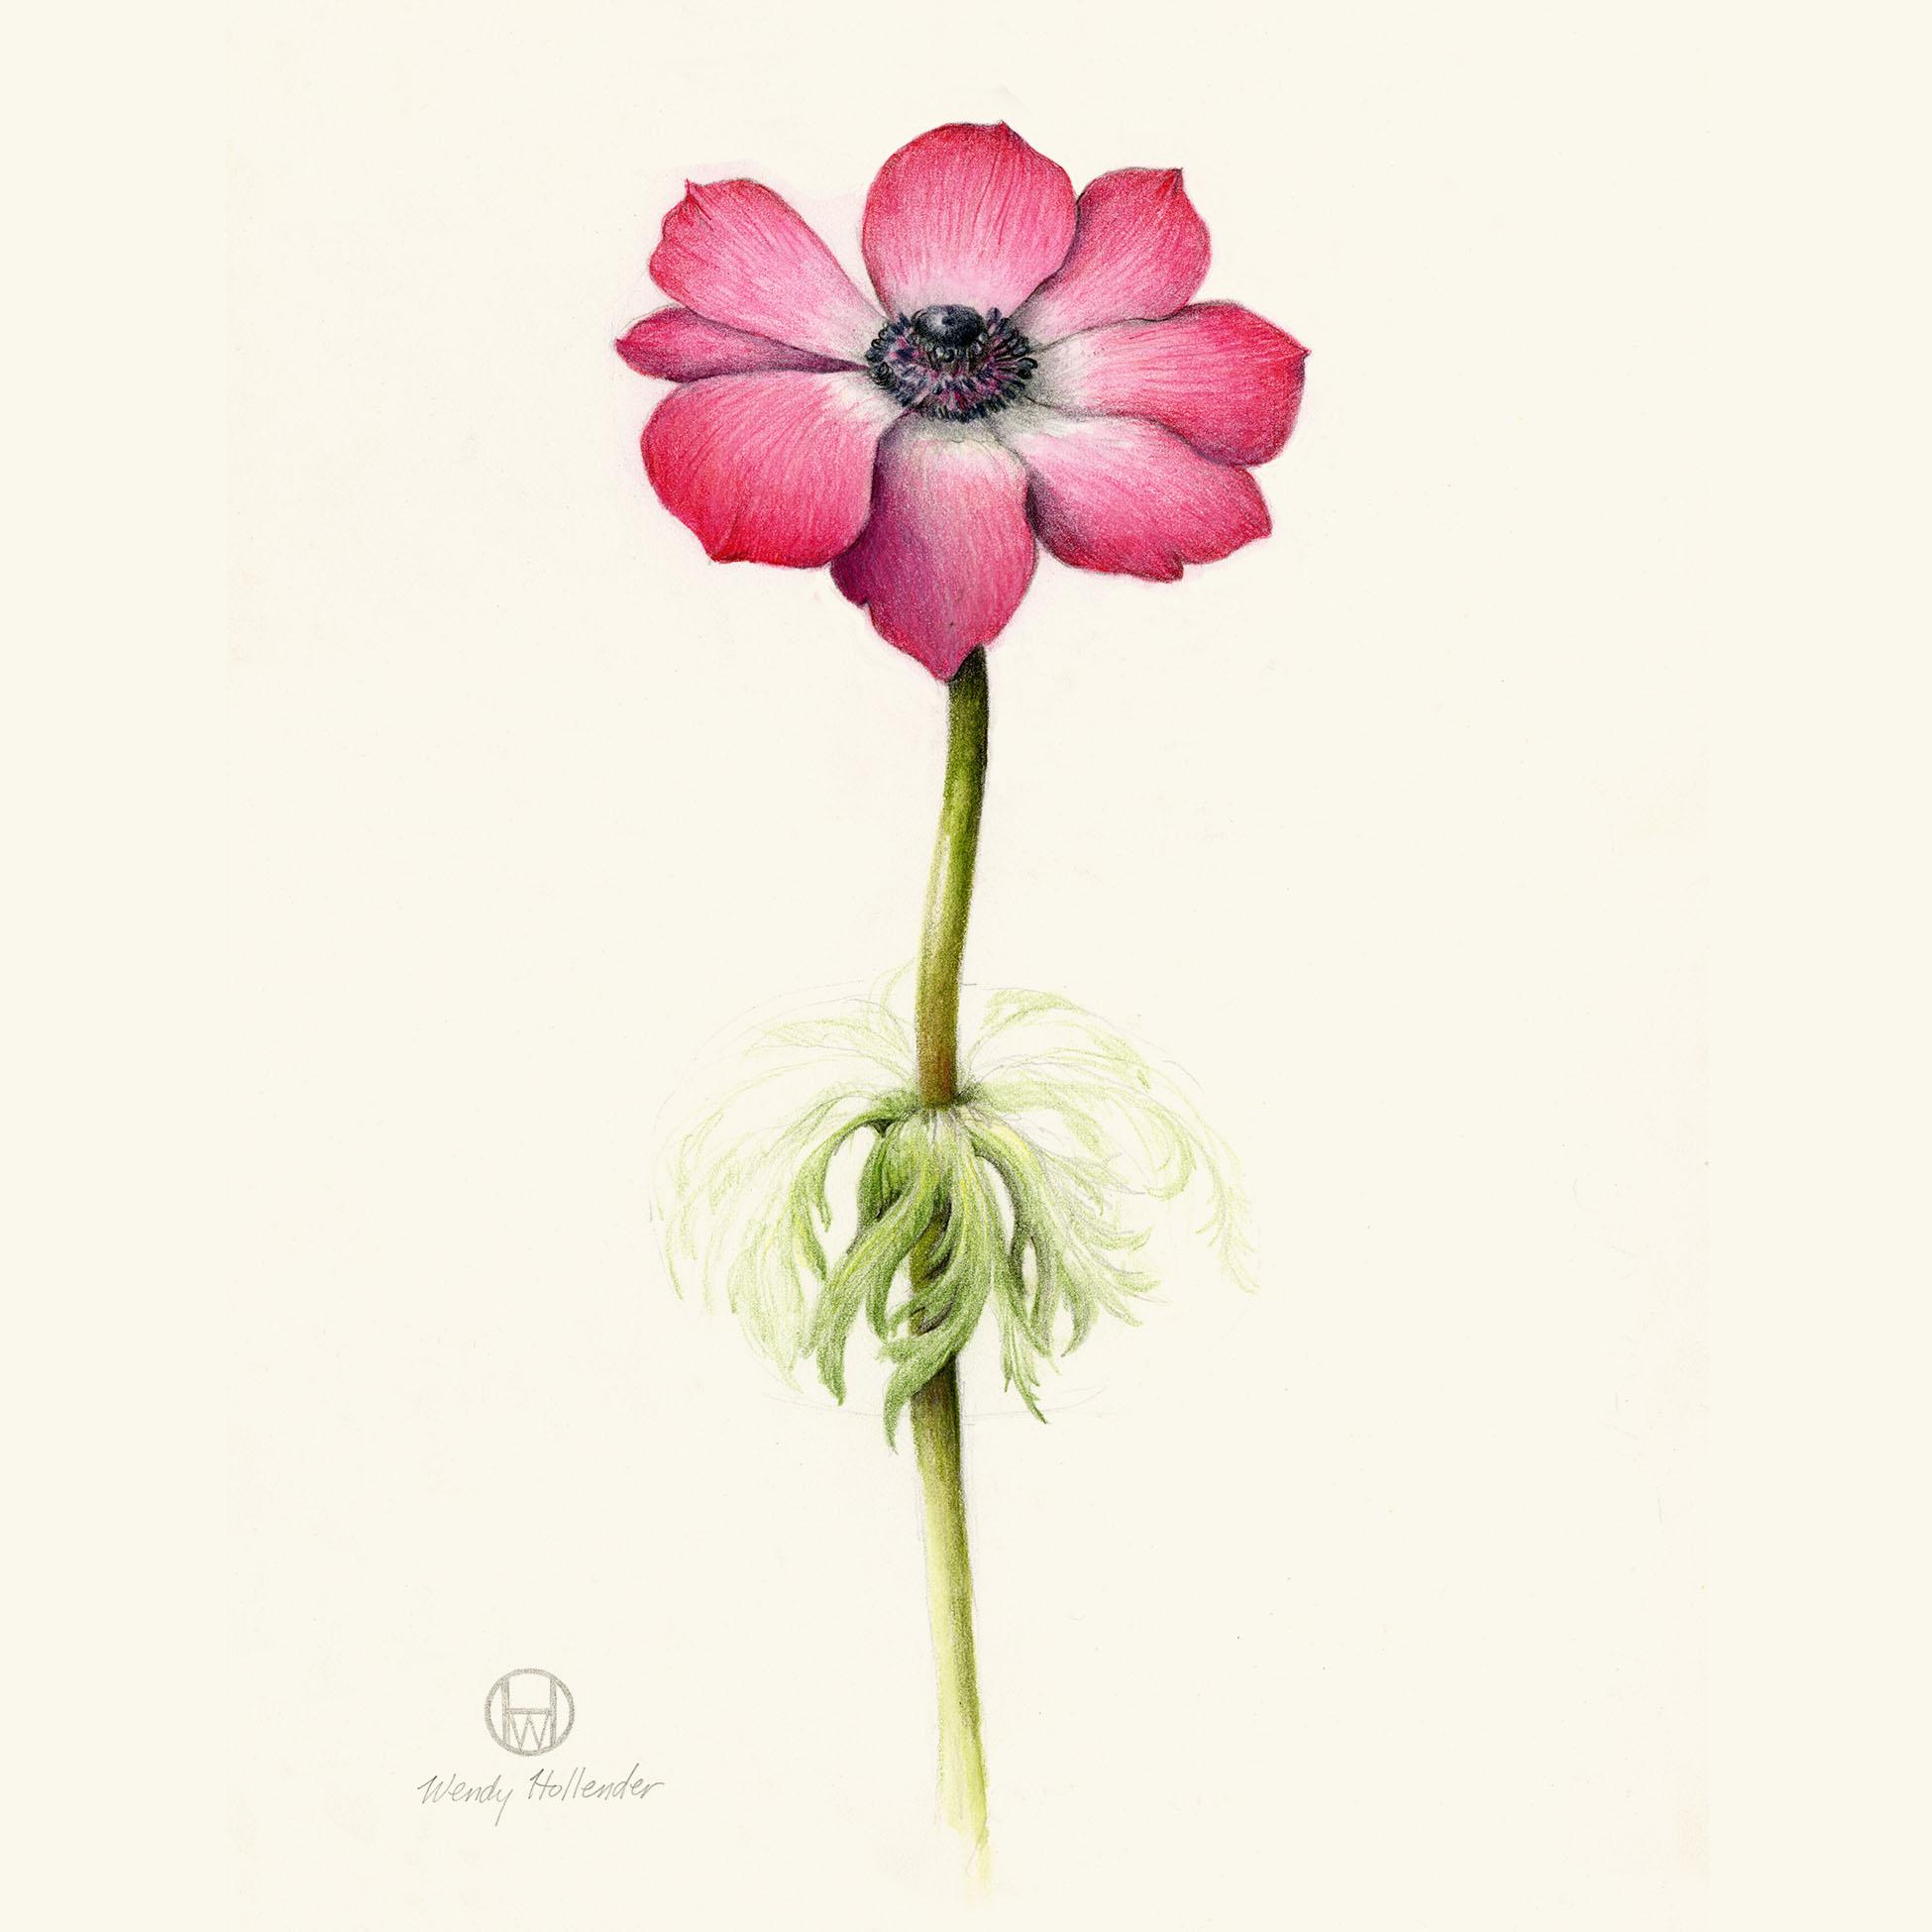 Anemone - Anemone nemorosa